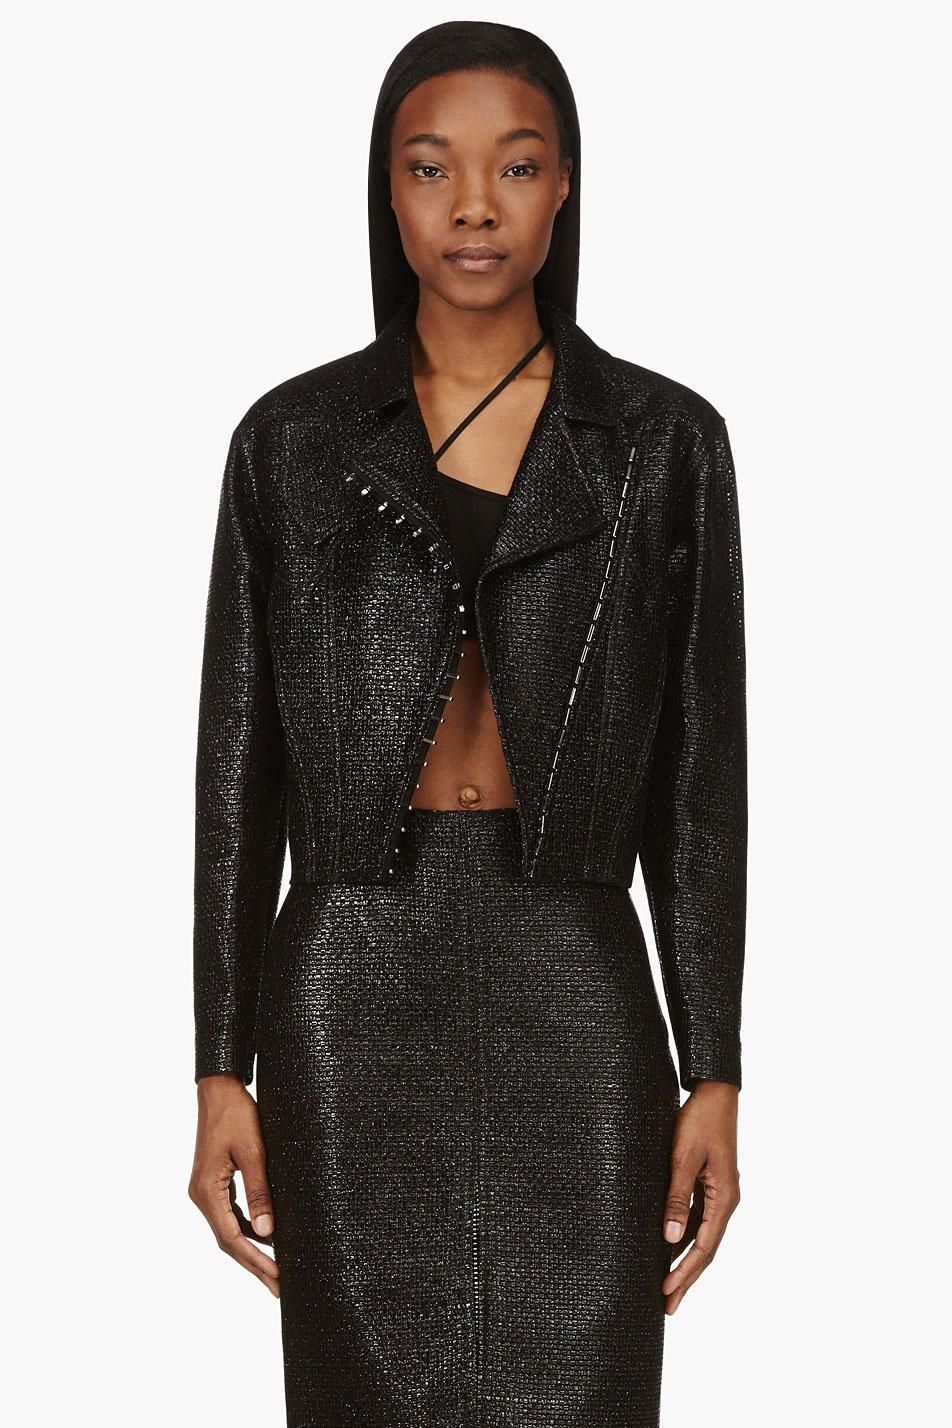 versace black glossy basketwoven jacket